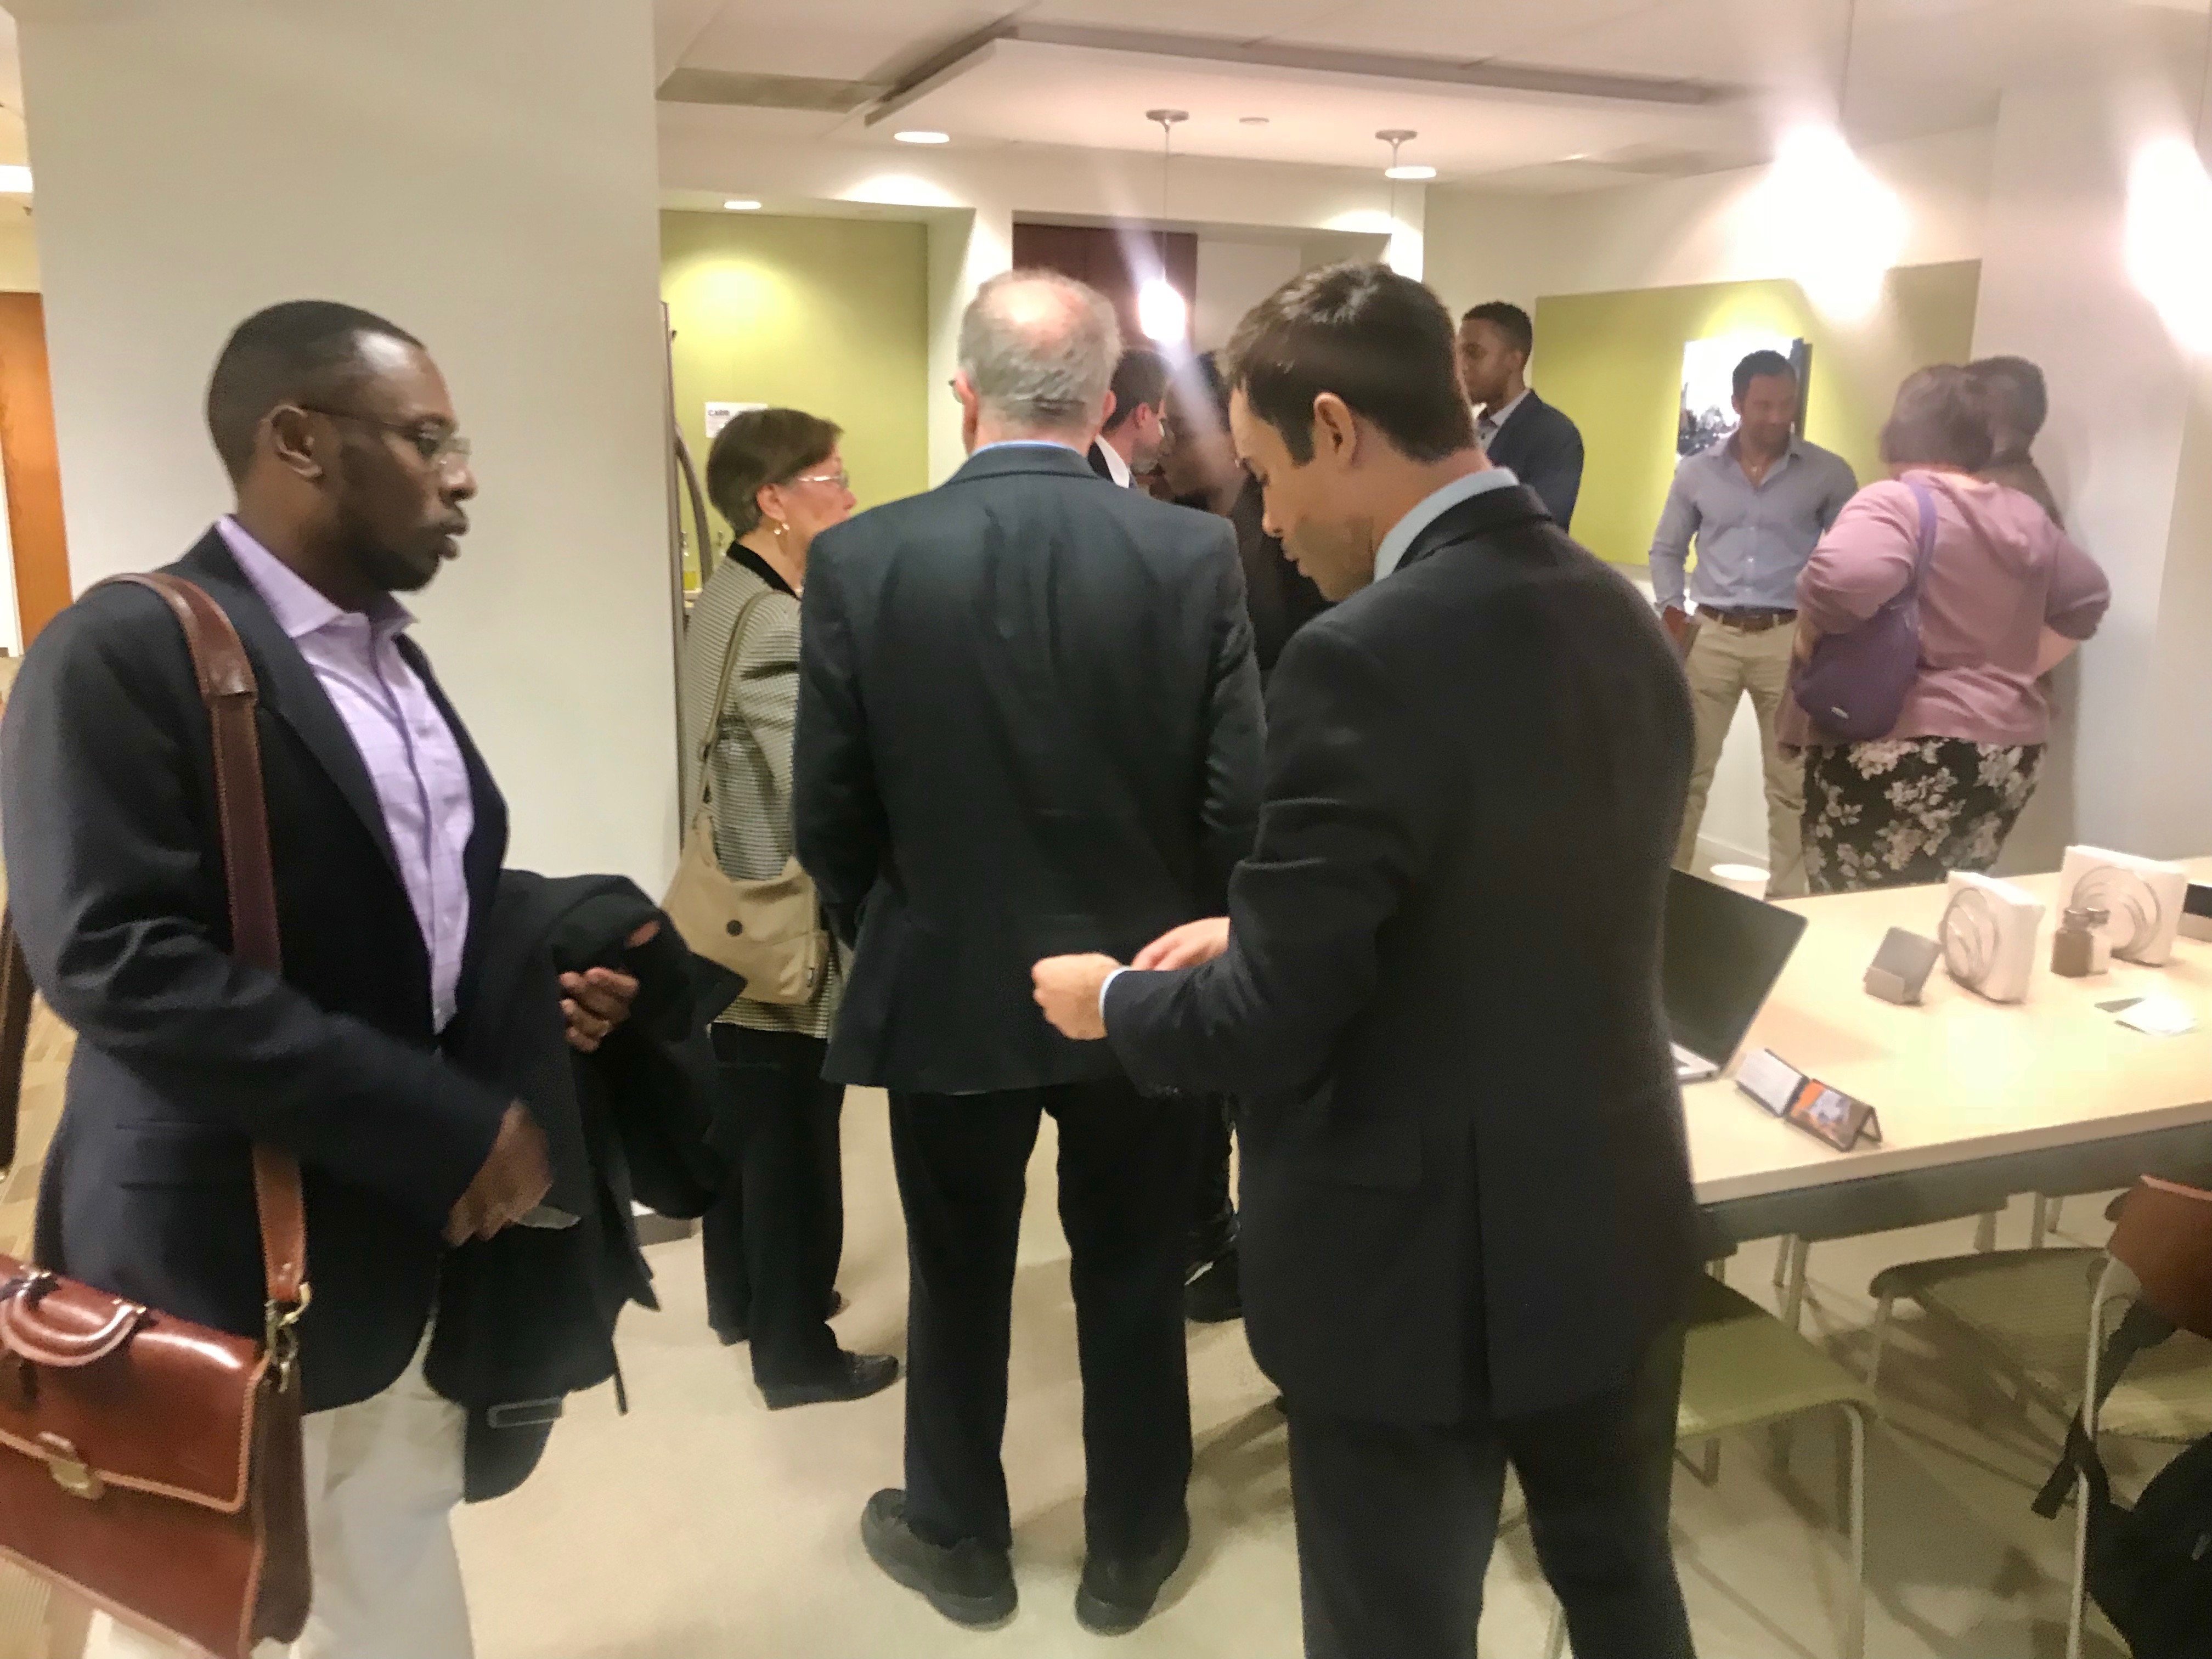 World-Advisory-Events-Small-Business-Networking-Washington-DC-10-24-18